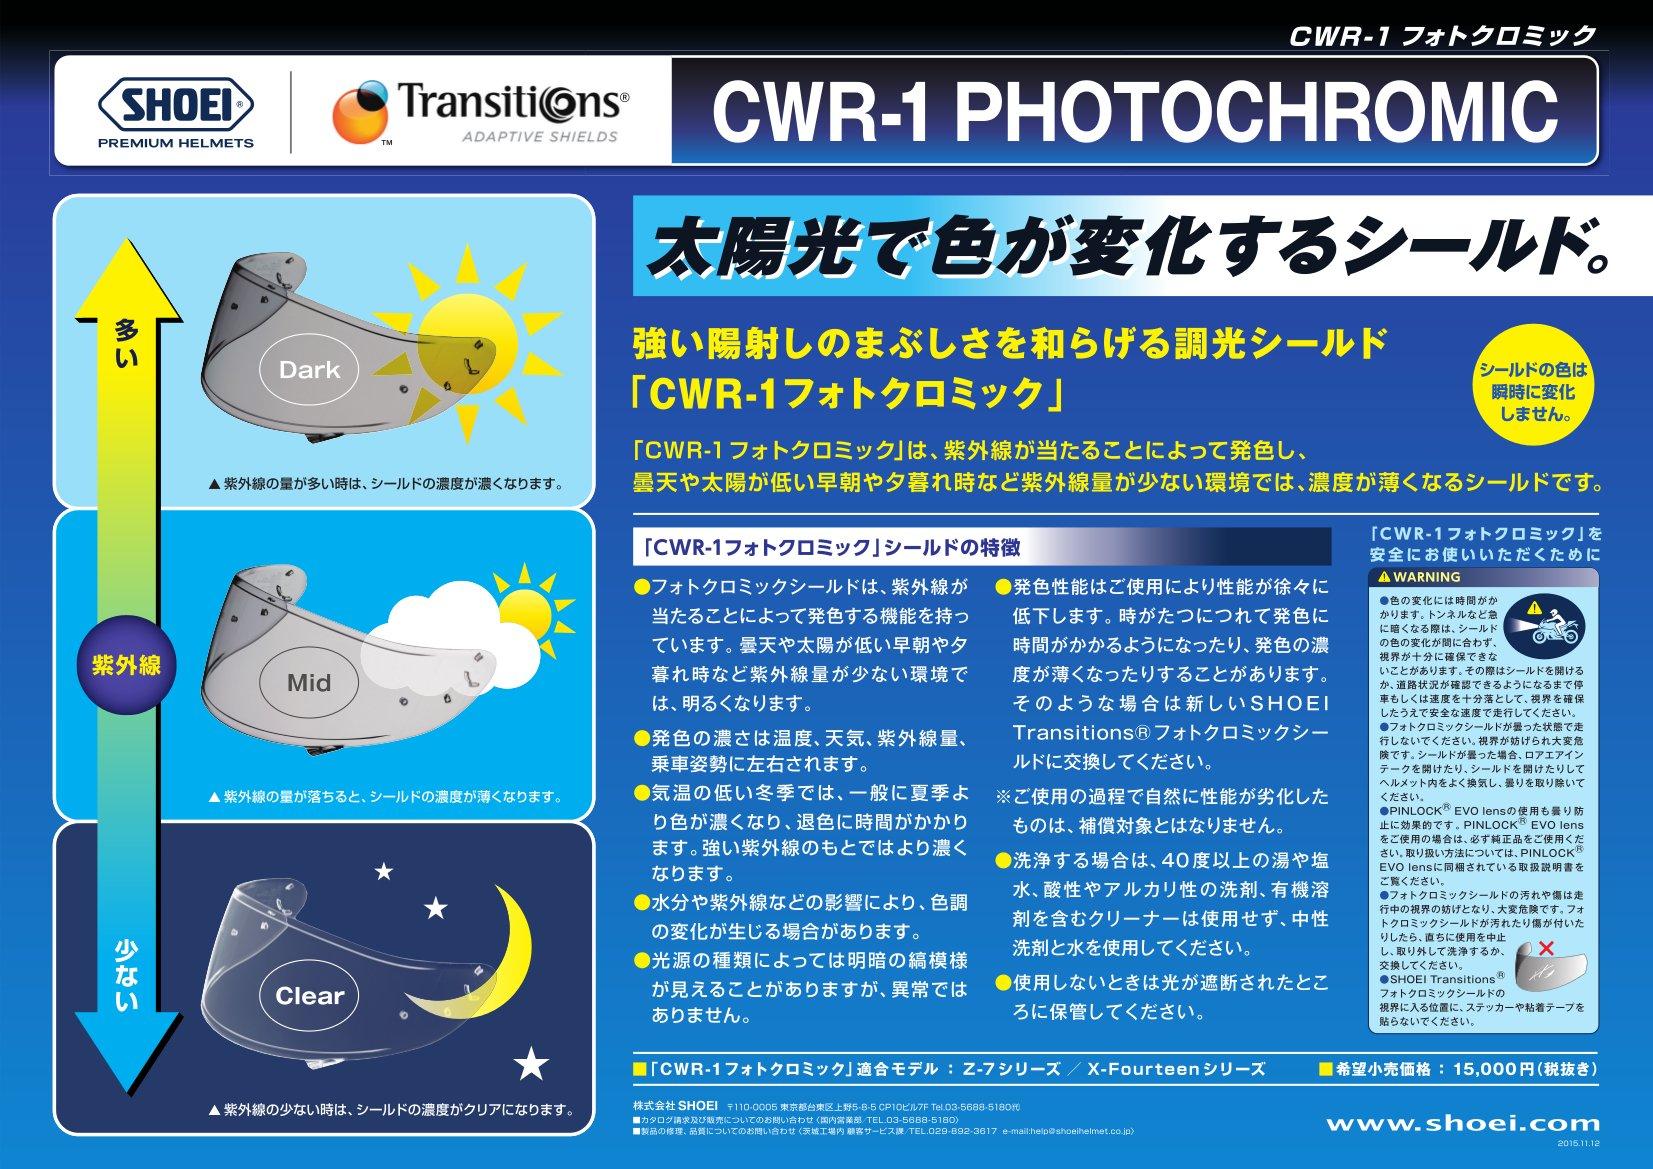 Shoei Shield CWR-1 PHOTOCHROMIC Visor for X-Fourteen, RF-1200 and RF-SR